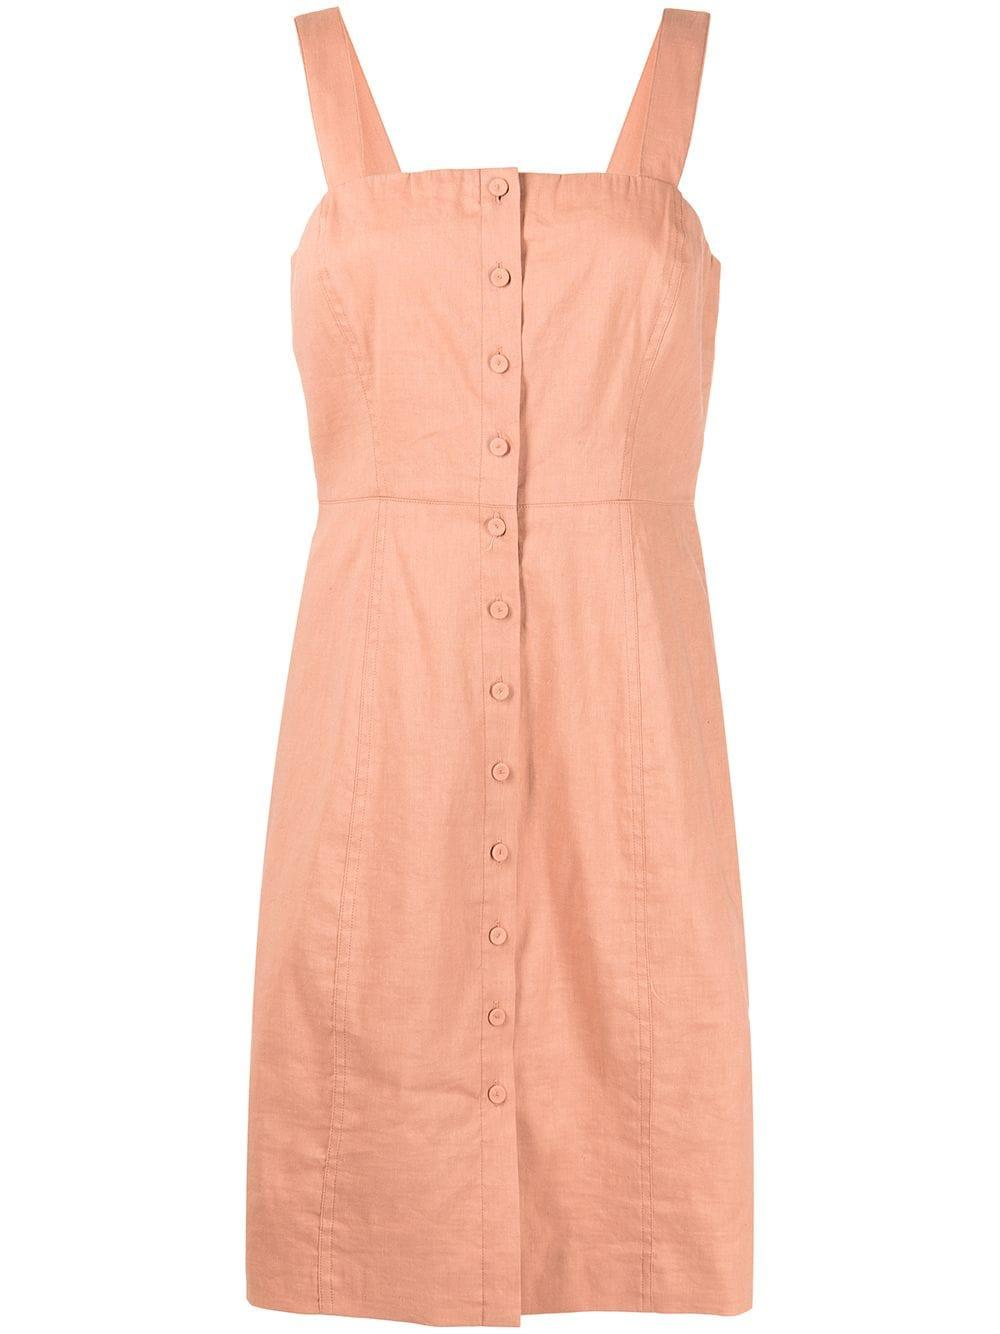 Kayleigh Dress Item # L0203611